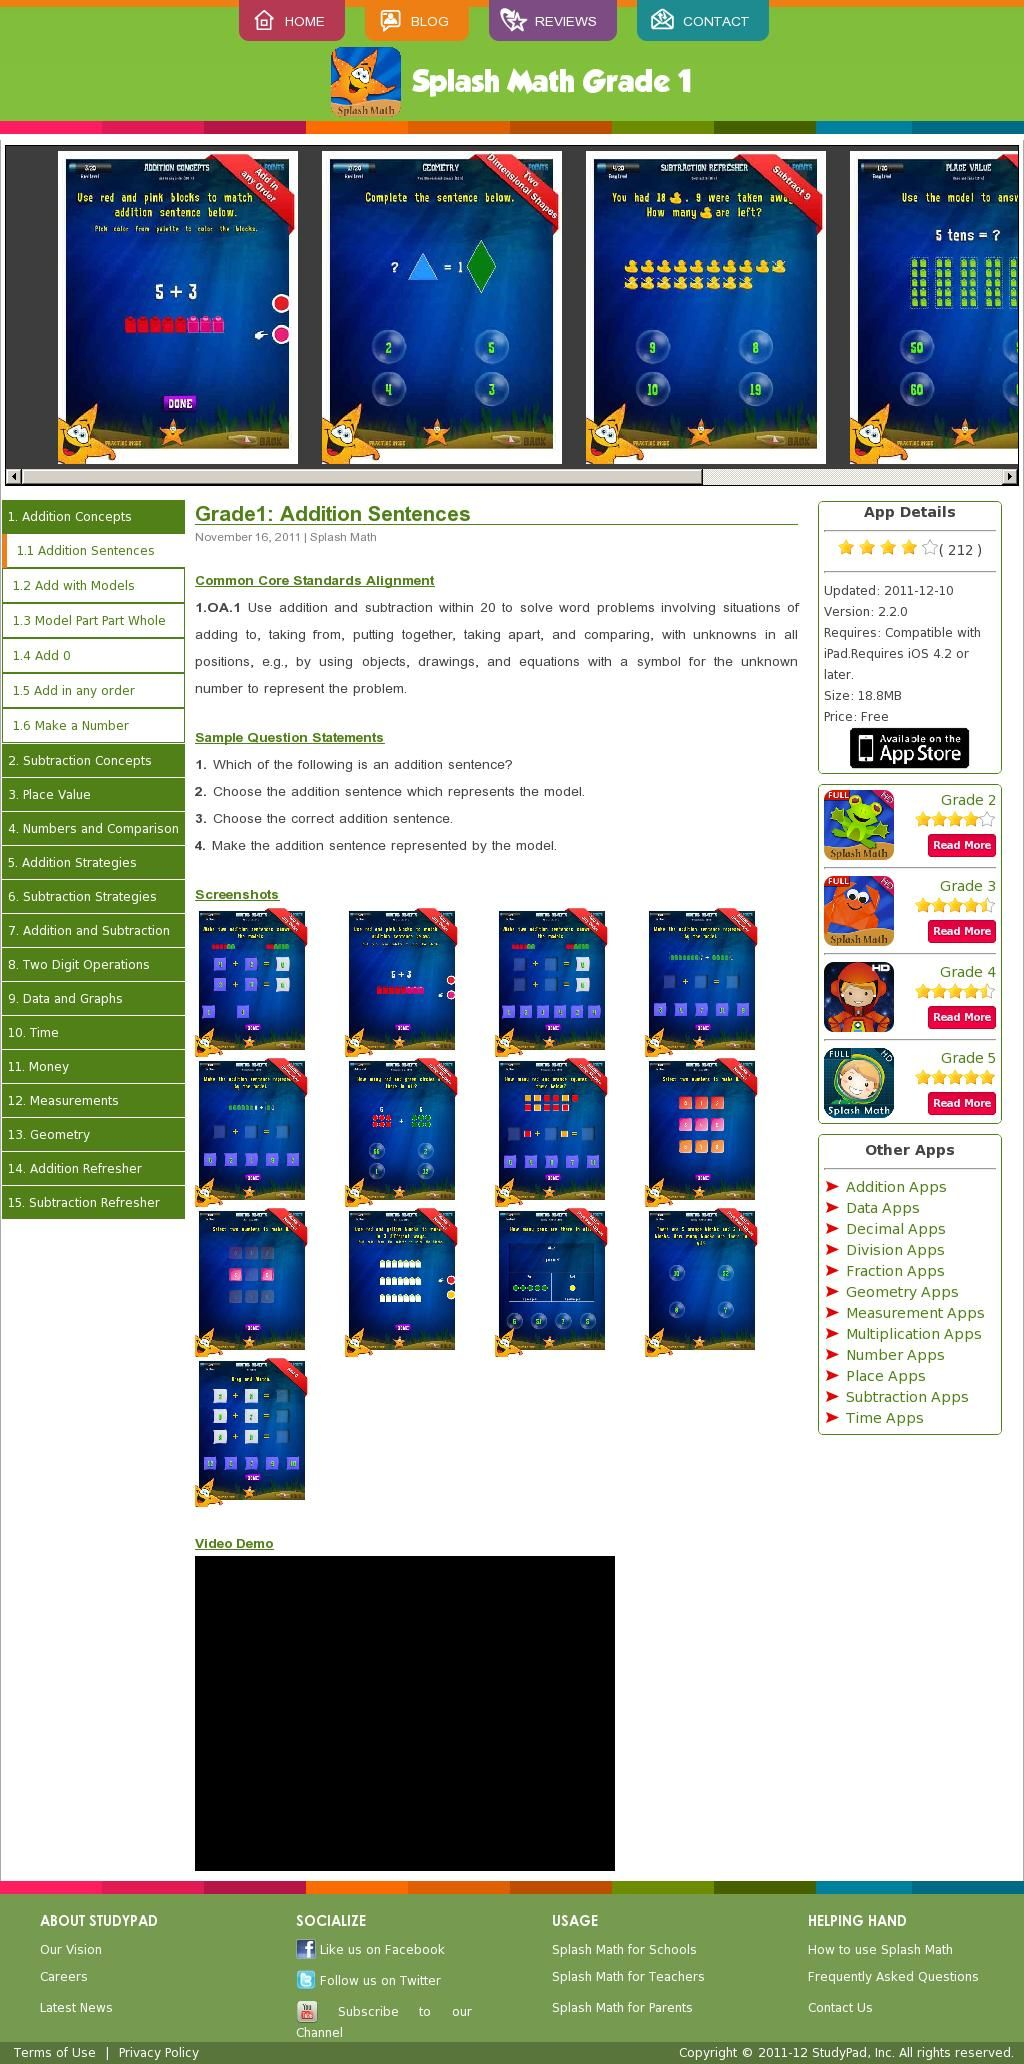 First Grade Splash Math App From Studypad